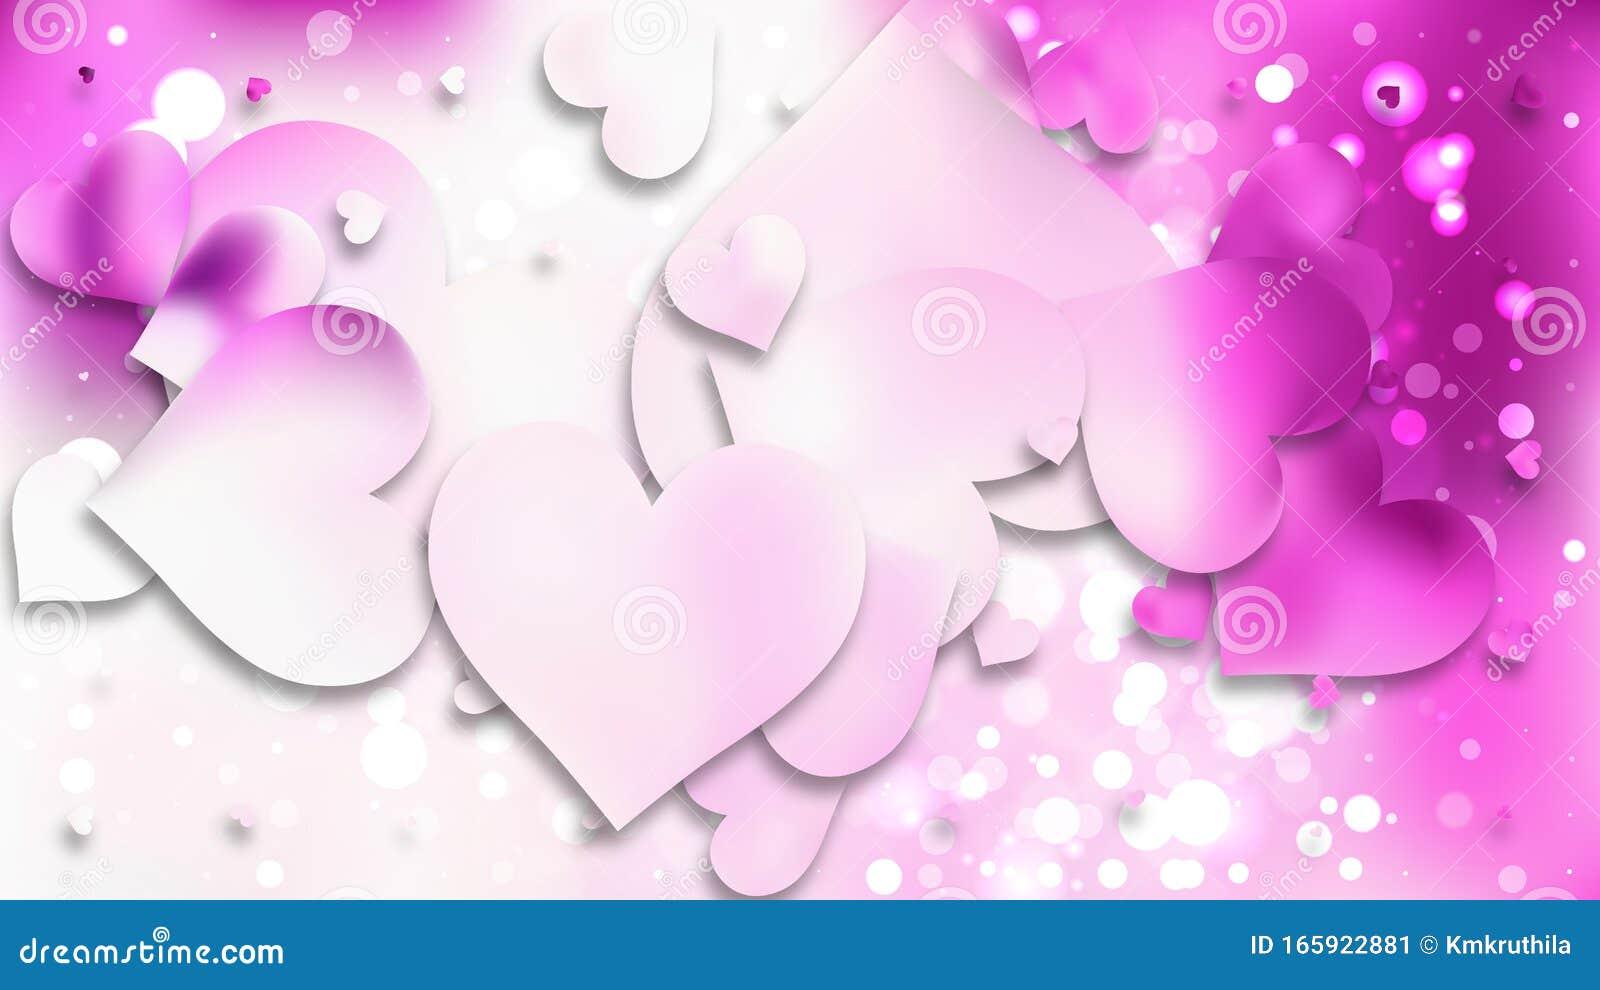 light purple heart wallpaper background vector art beautiful elegant illustration graphic design 165922881